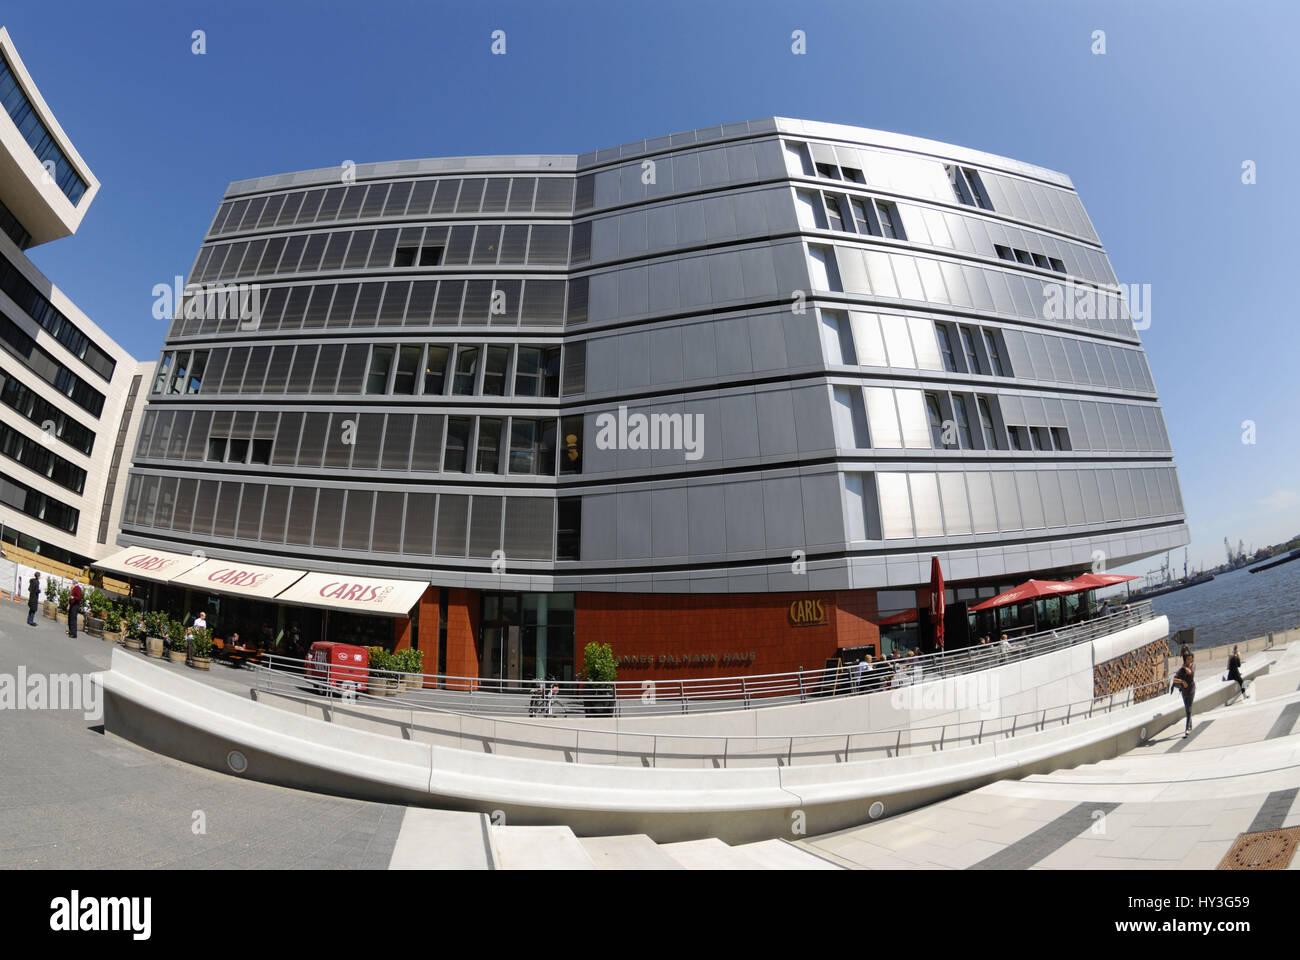 Hamburg Restaurant Stockfotos & Hamburg Restaurant Bilder